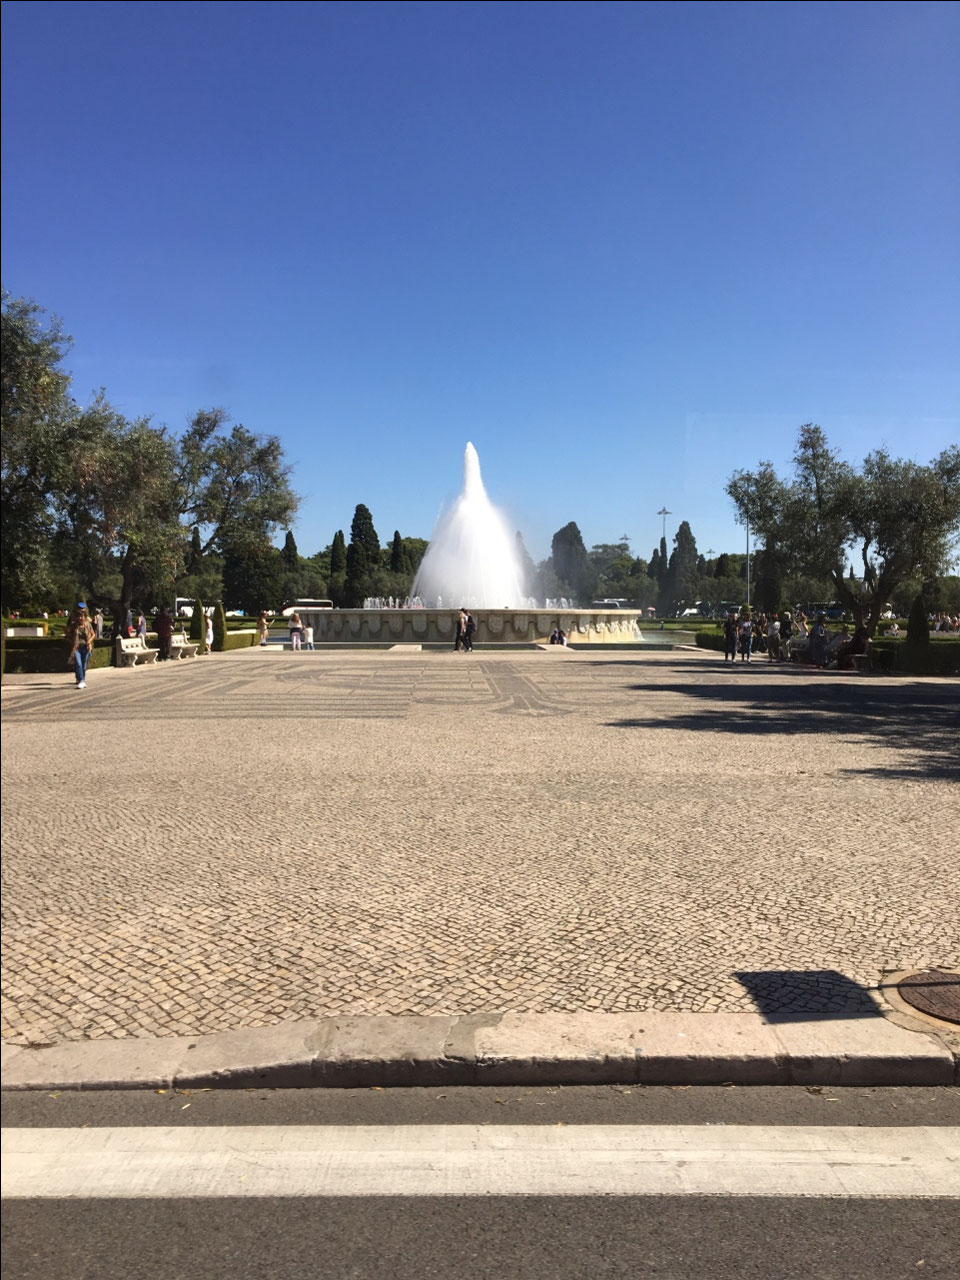 A fountain in Bellem